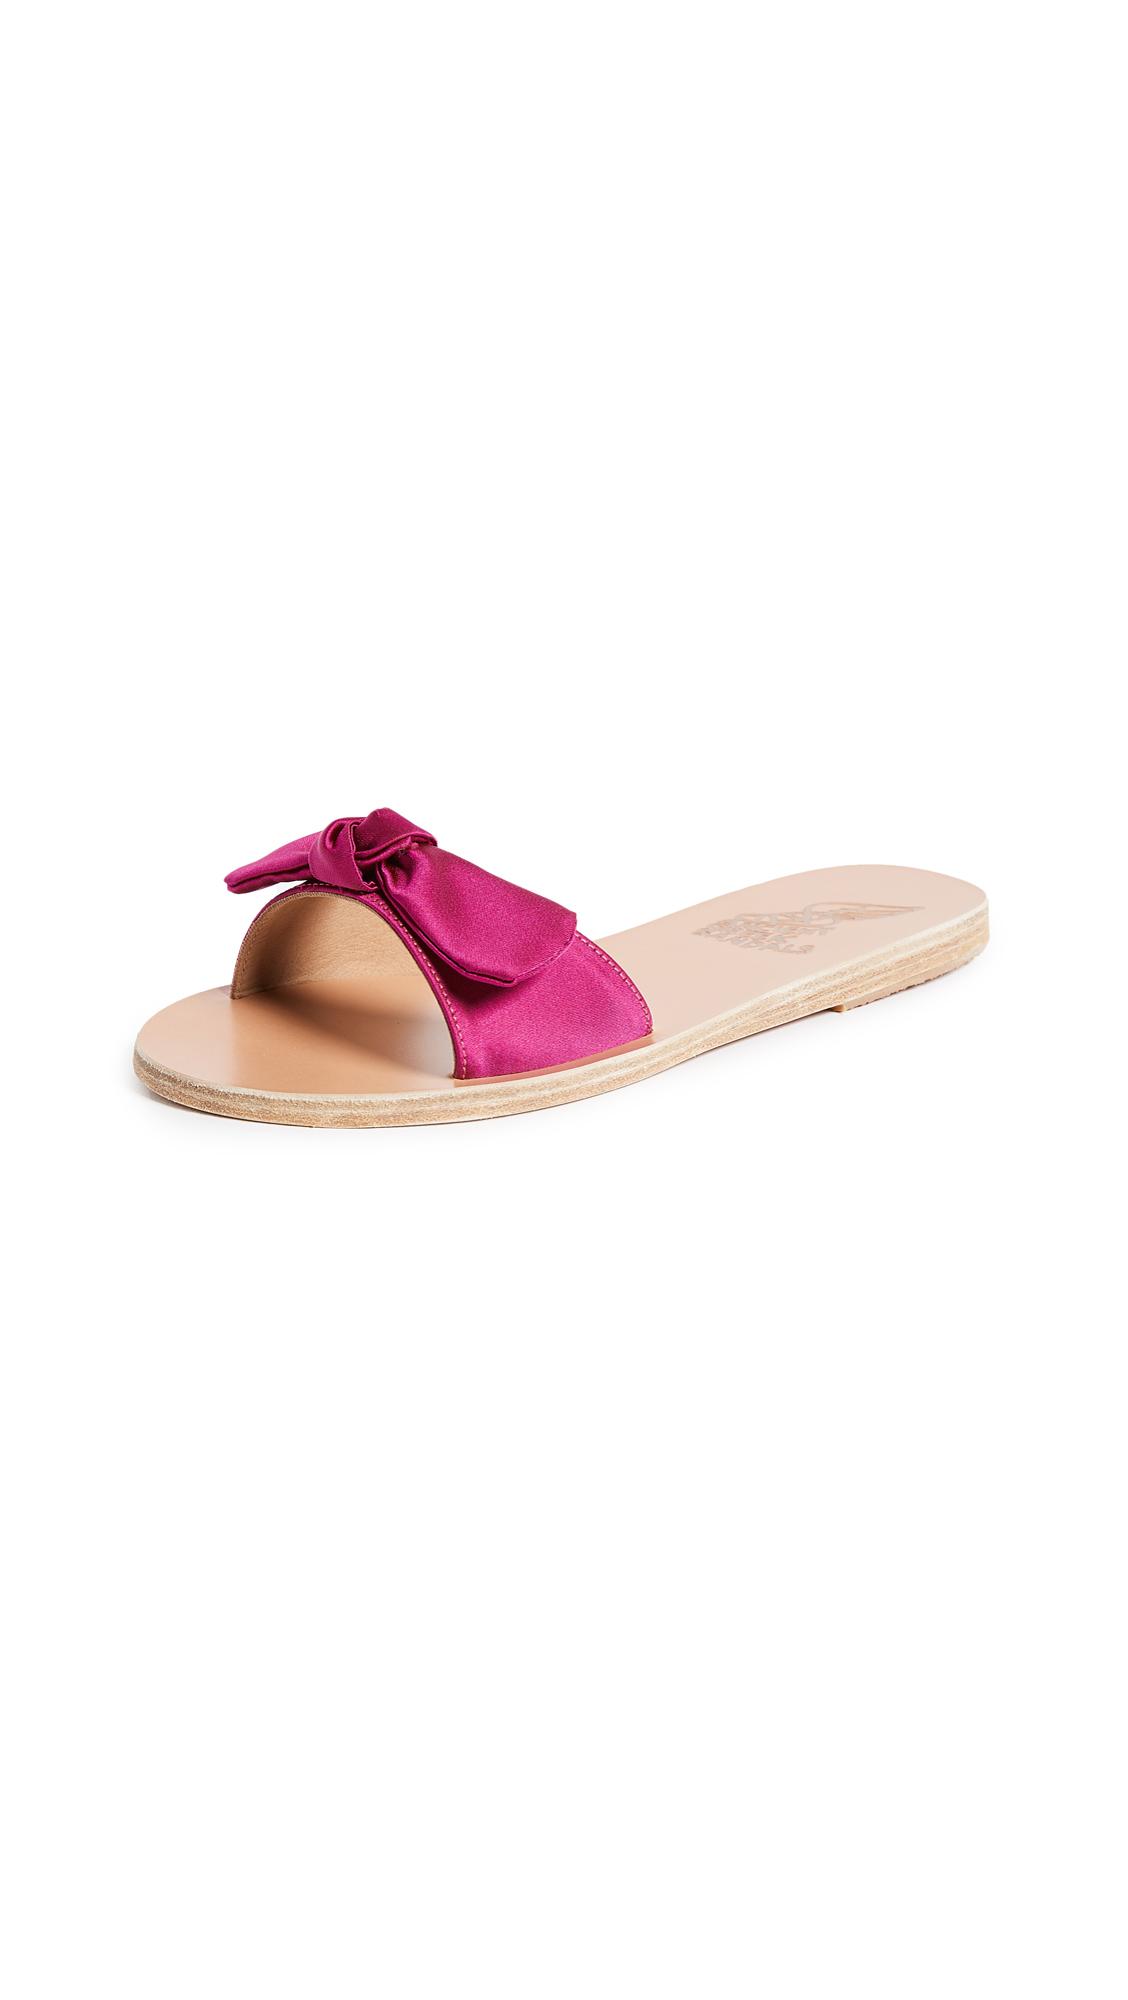 Ancient Greek Sandals Alki Bow Slide Sandals - Cassis